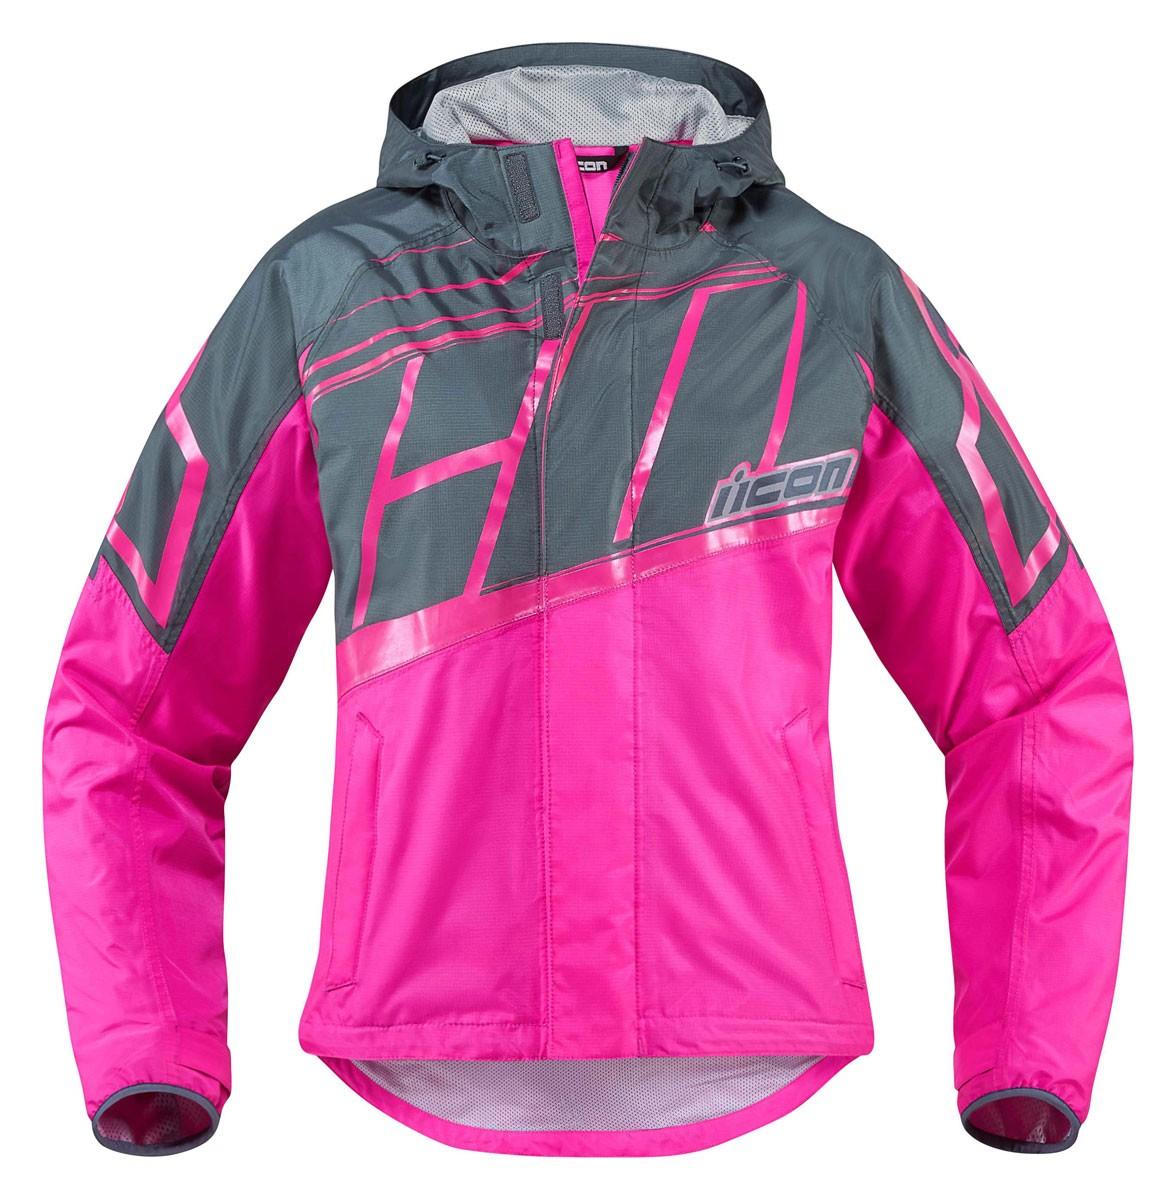 ICON Women's PDX 2 Waterproof Nylon Motorcycle Rain Jacket (Pink)